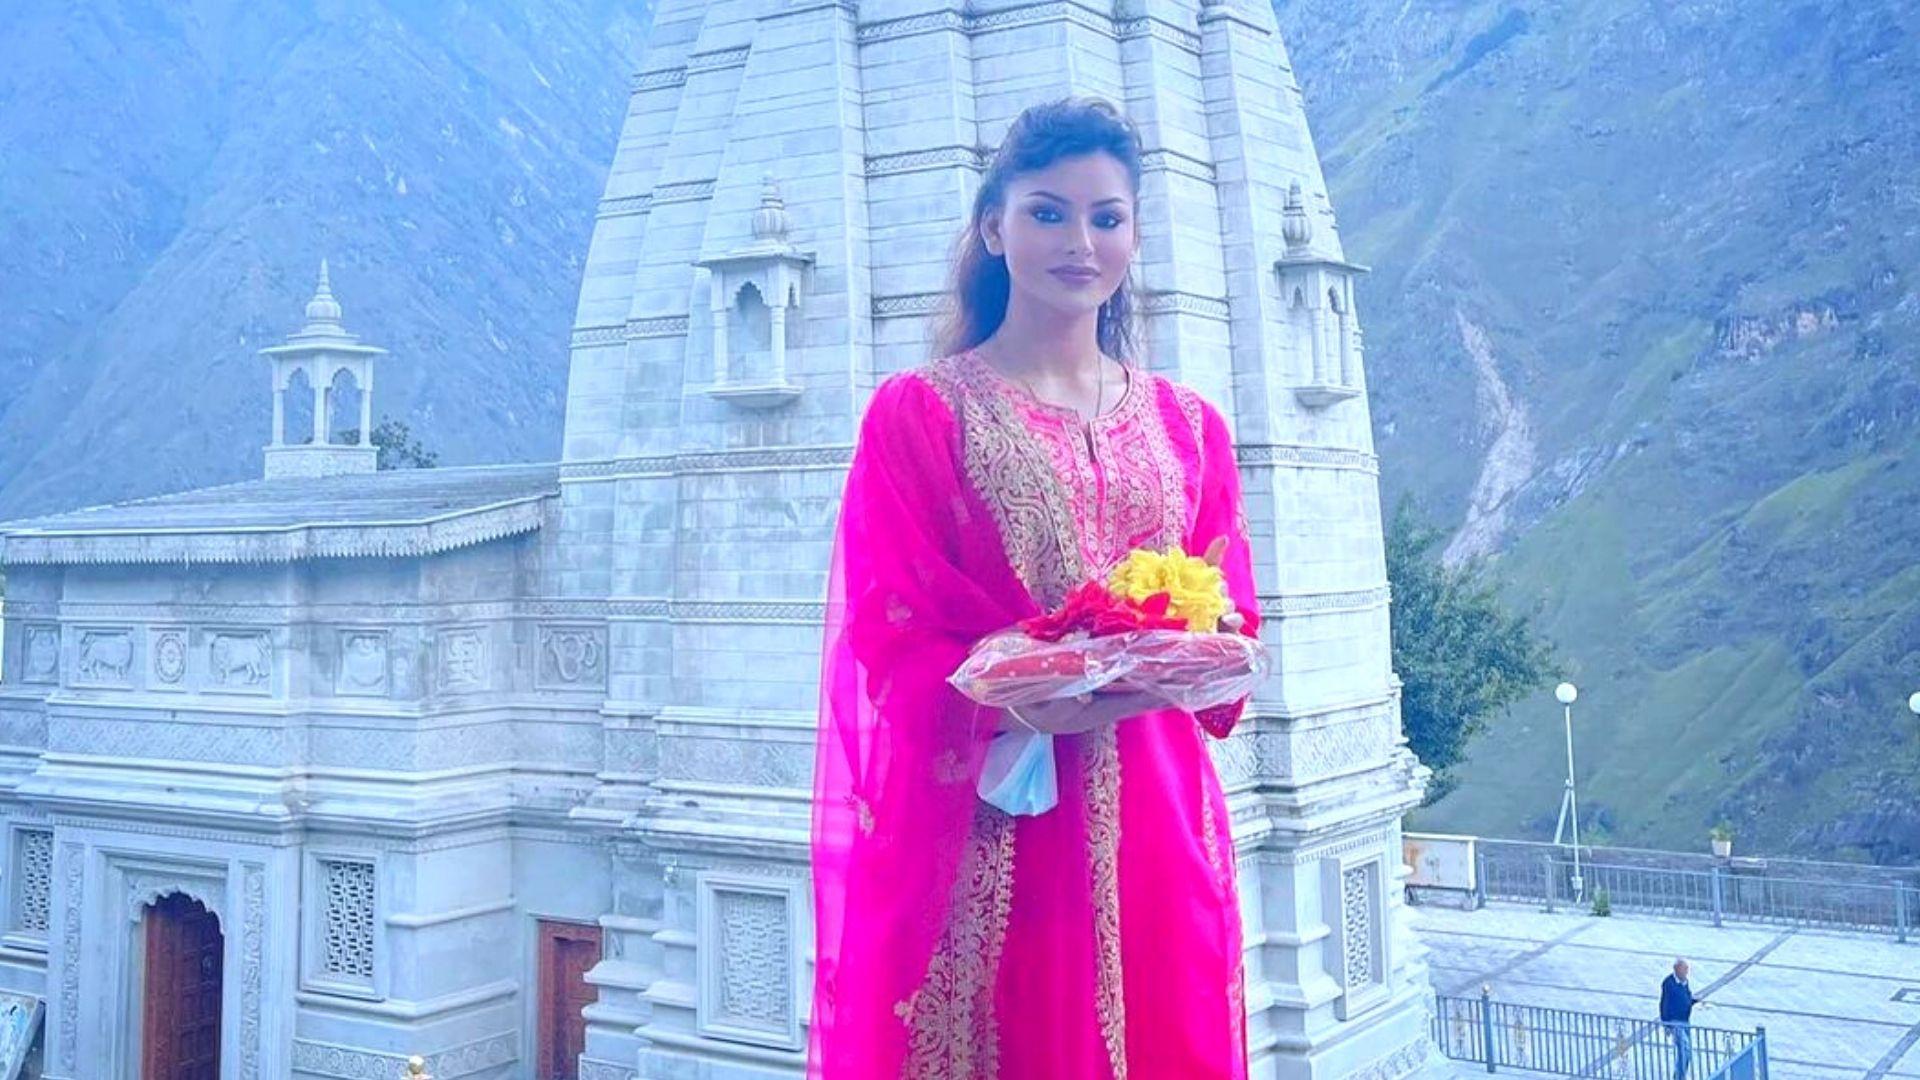 Navratri 2021: Urvashi Rautela Seeks Blessings At Joshimath Temple In Uttarakhand On The Auspicious Day Actress Sends Warm Wishes Across